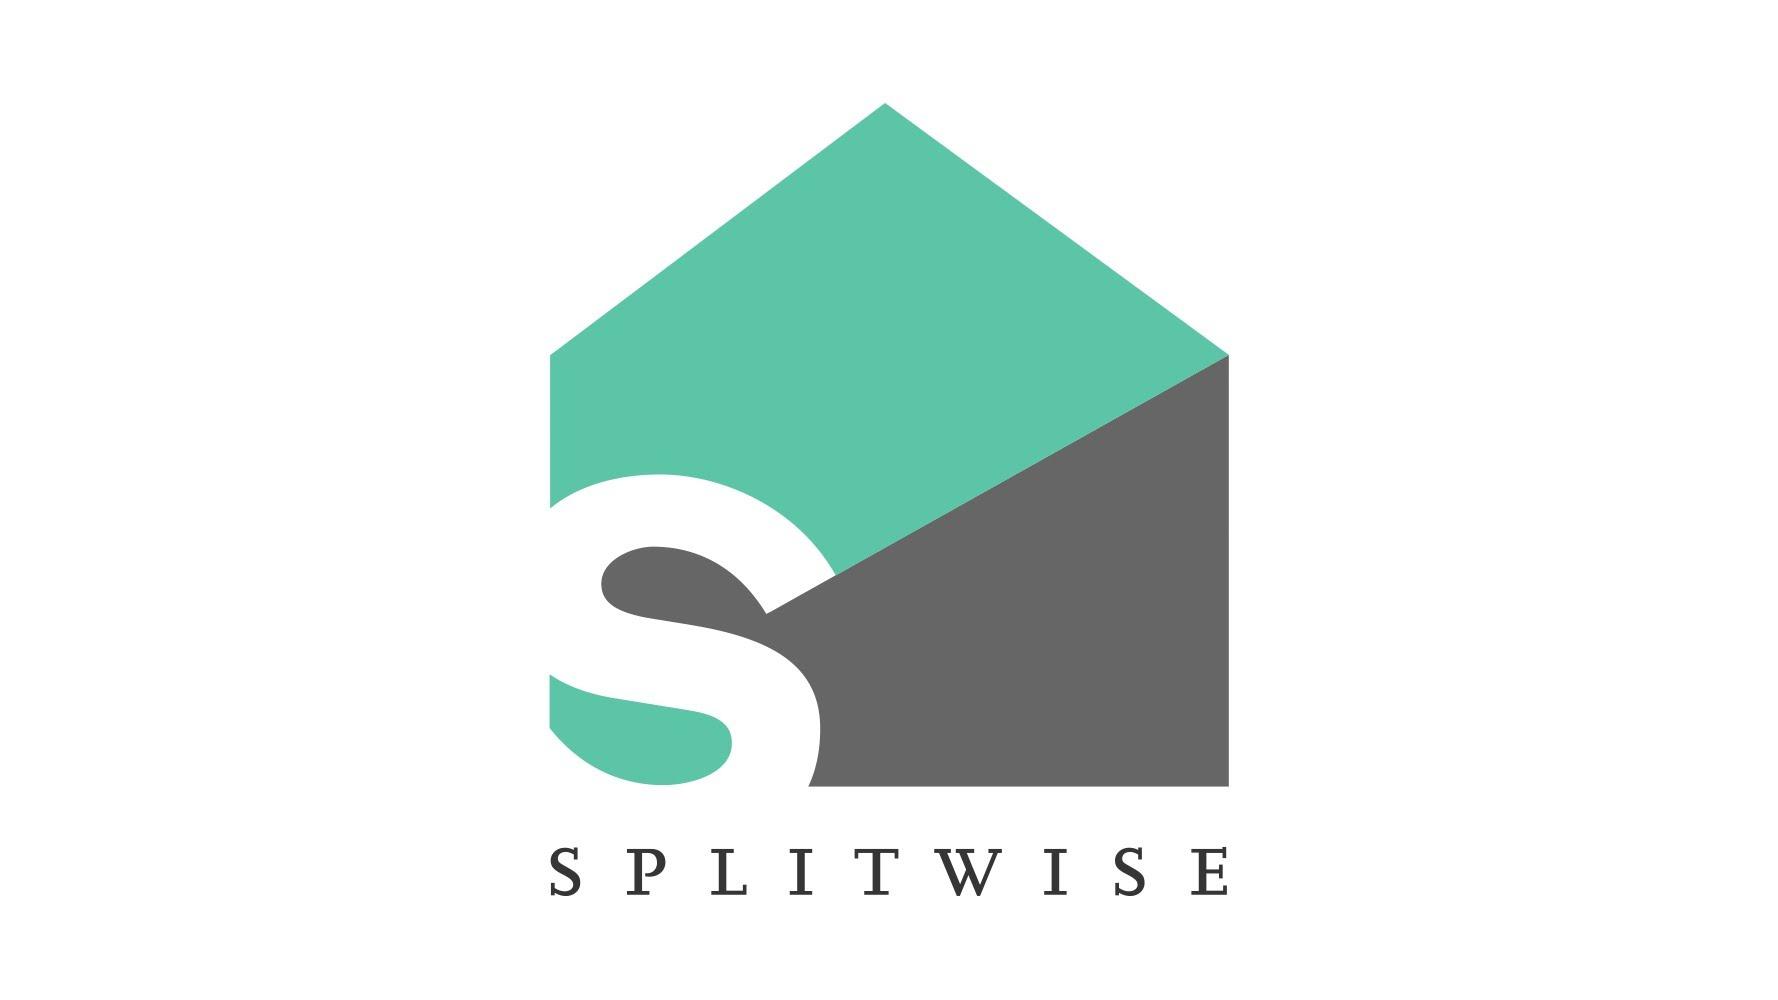 splitwise_logo.jpg